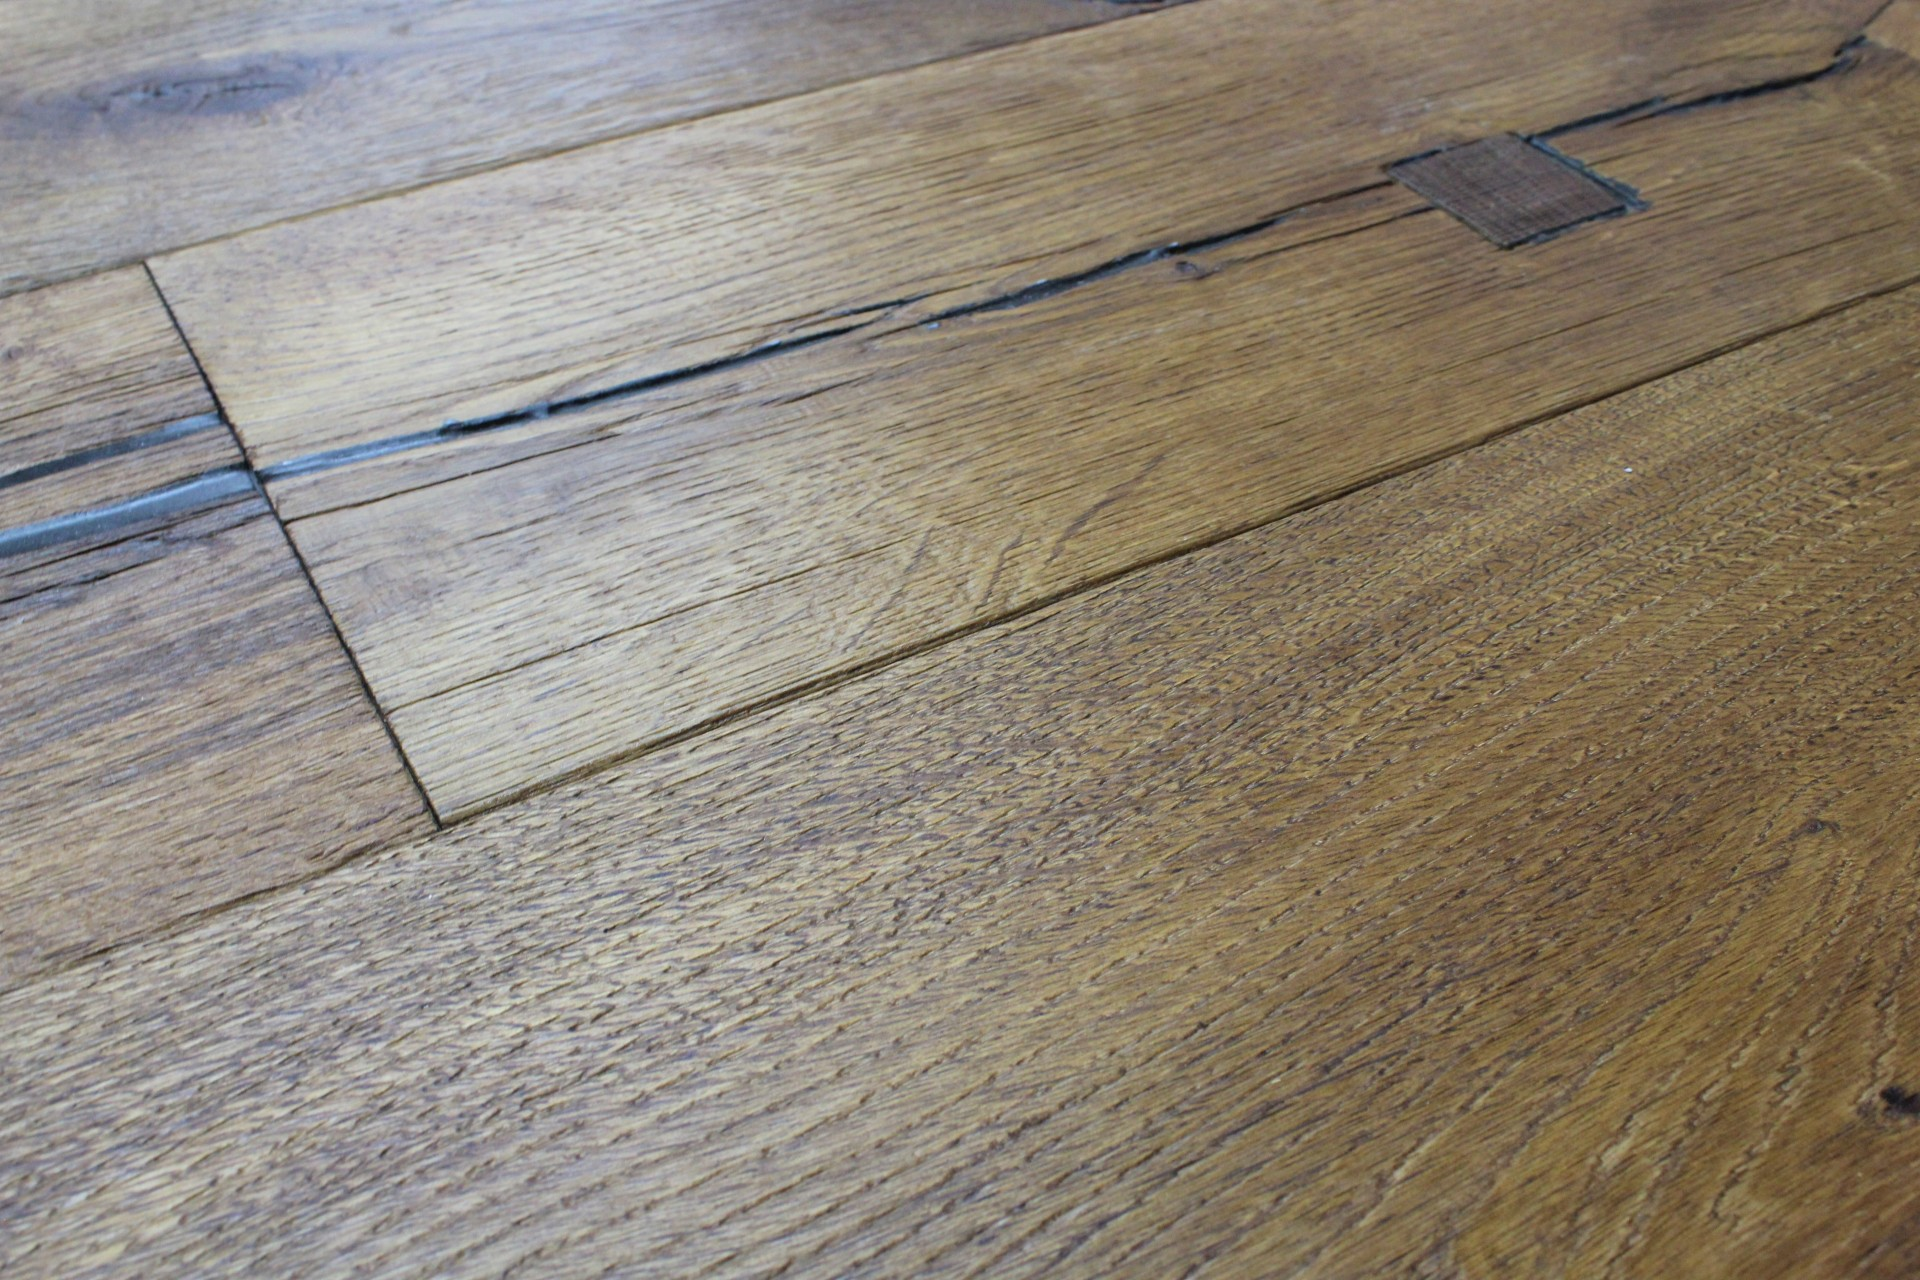 Hardwood, prefinished floor, engineered wood, solid wood, lifestyle, hard surface, prefinished hardwood, prefinished wood, home, design, interior design, wood floor design, kahrs